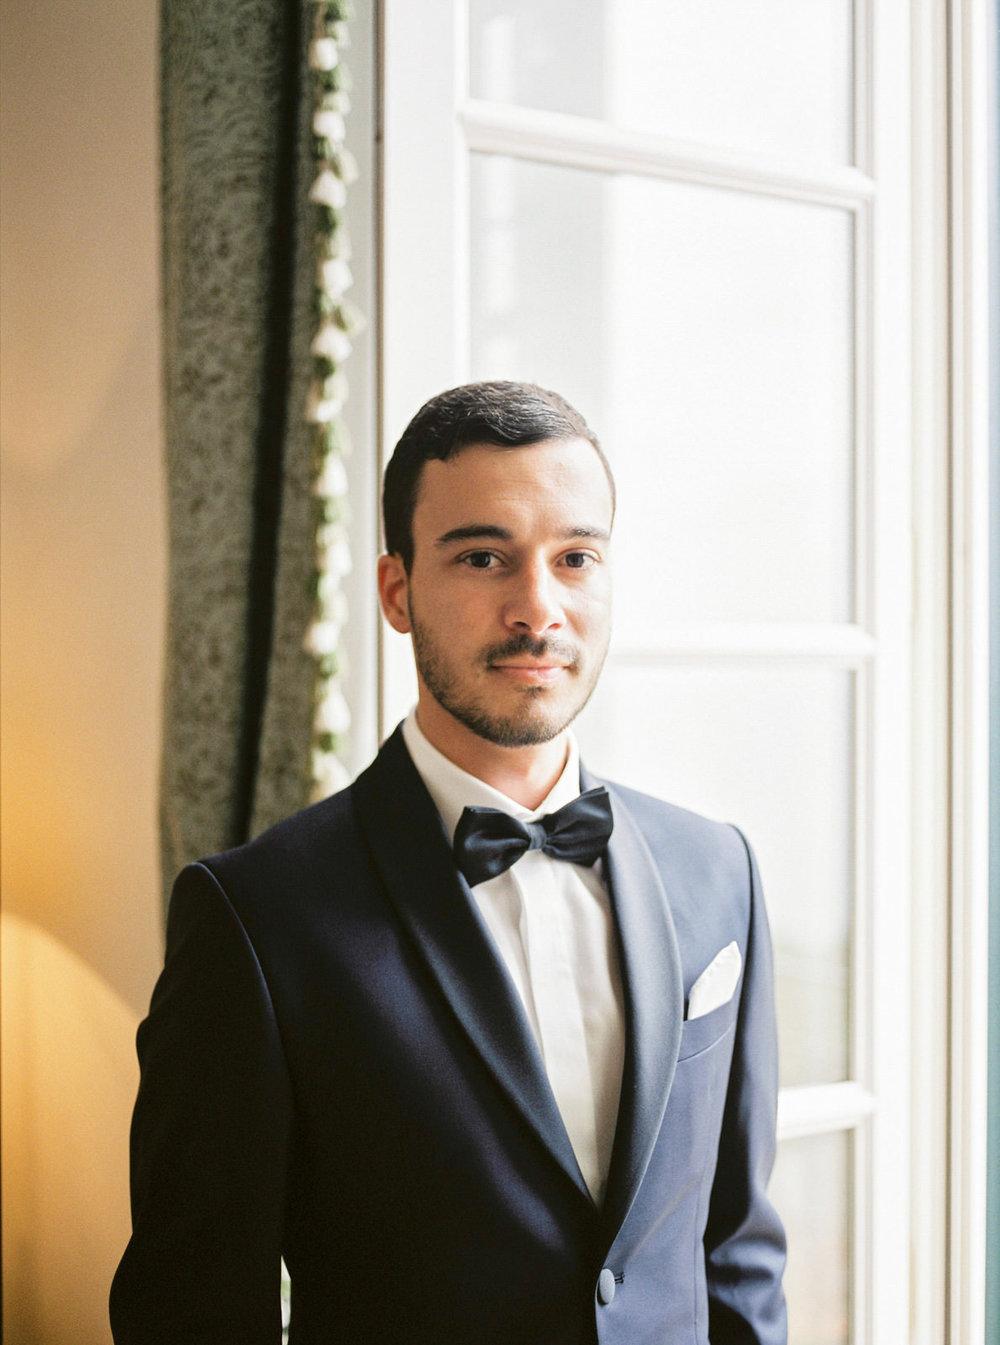 Belmond Grand Hotel Timeo Wedding by CHYMO & MORE